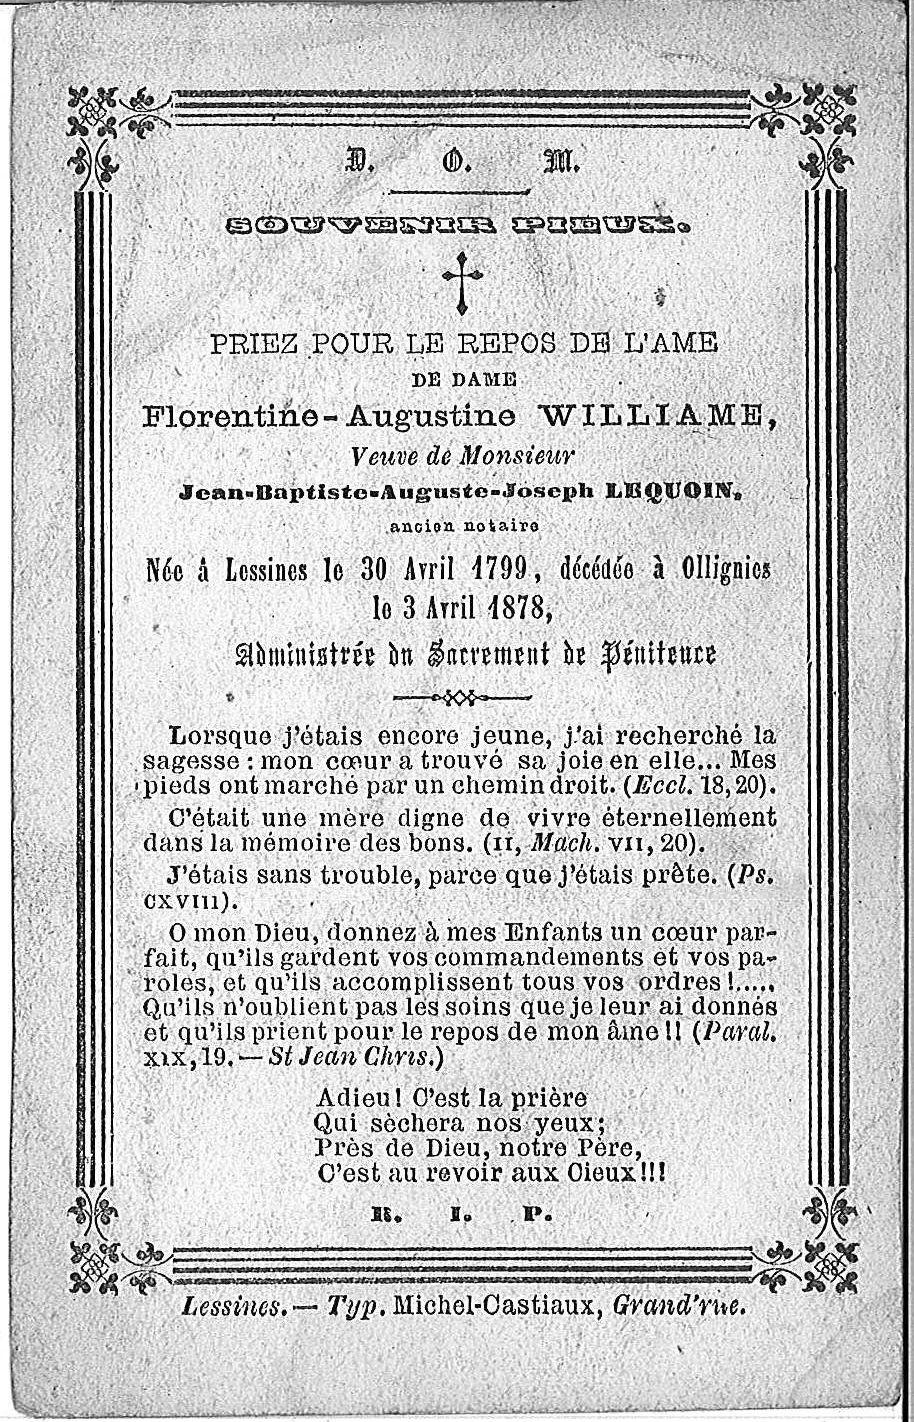 Florentine-Augustine Williame